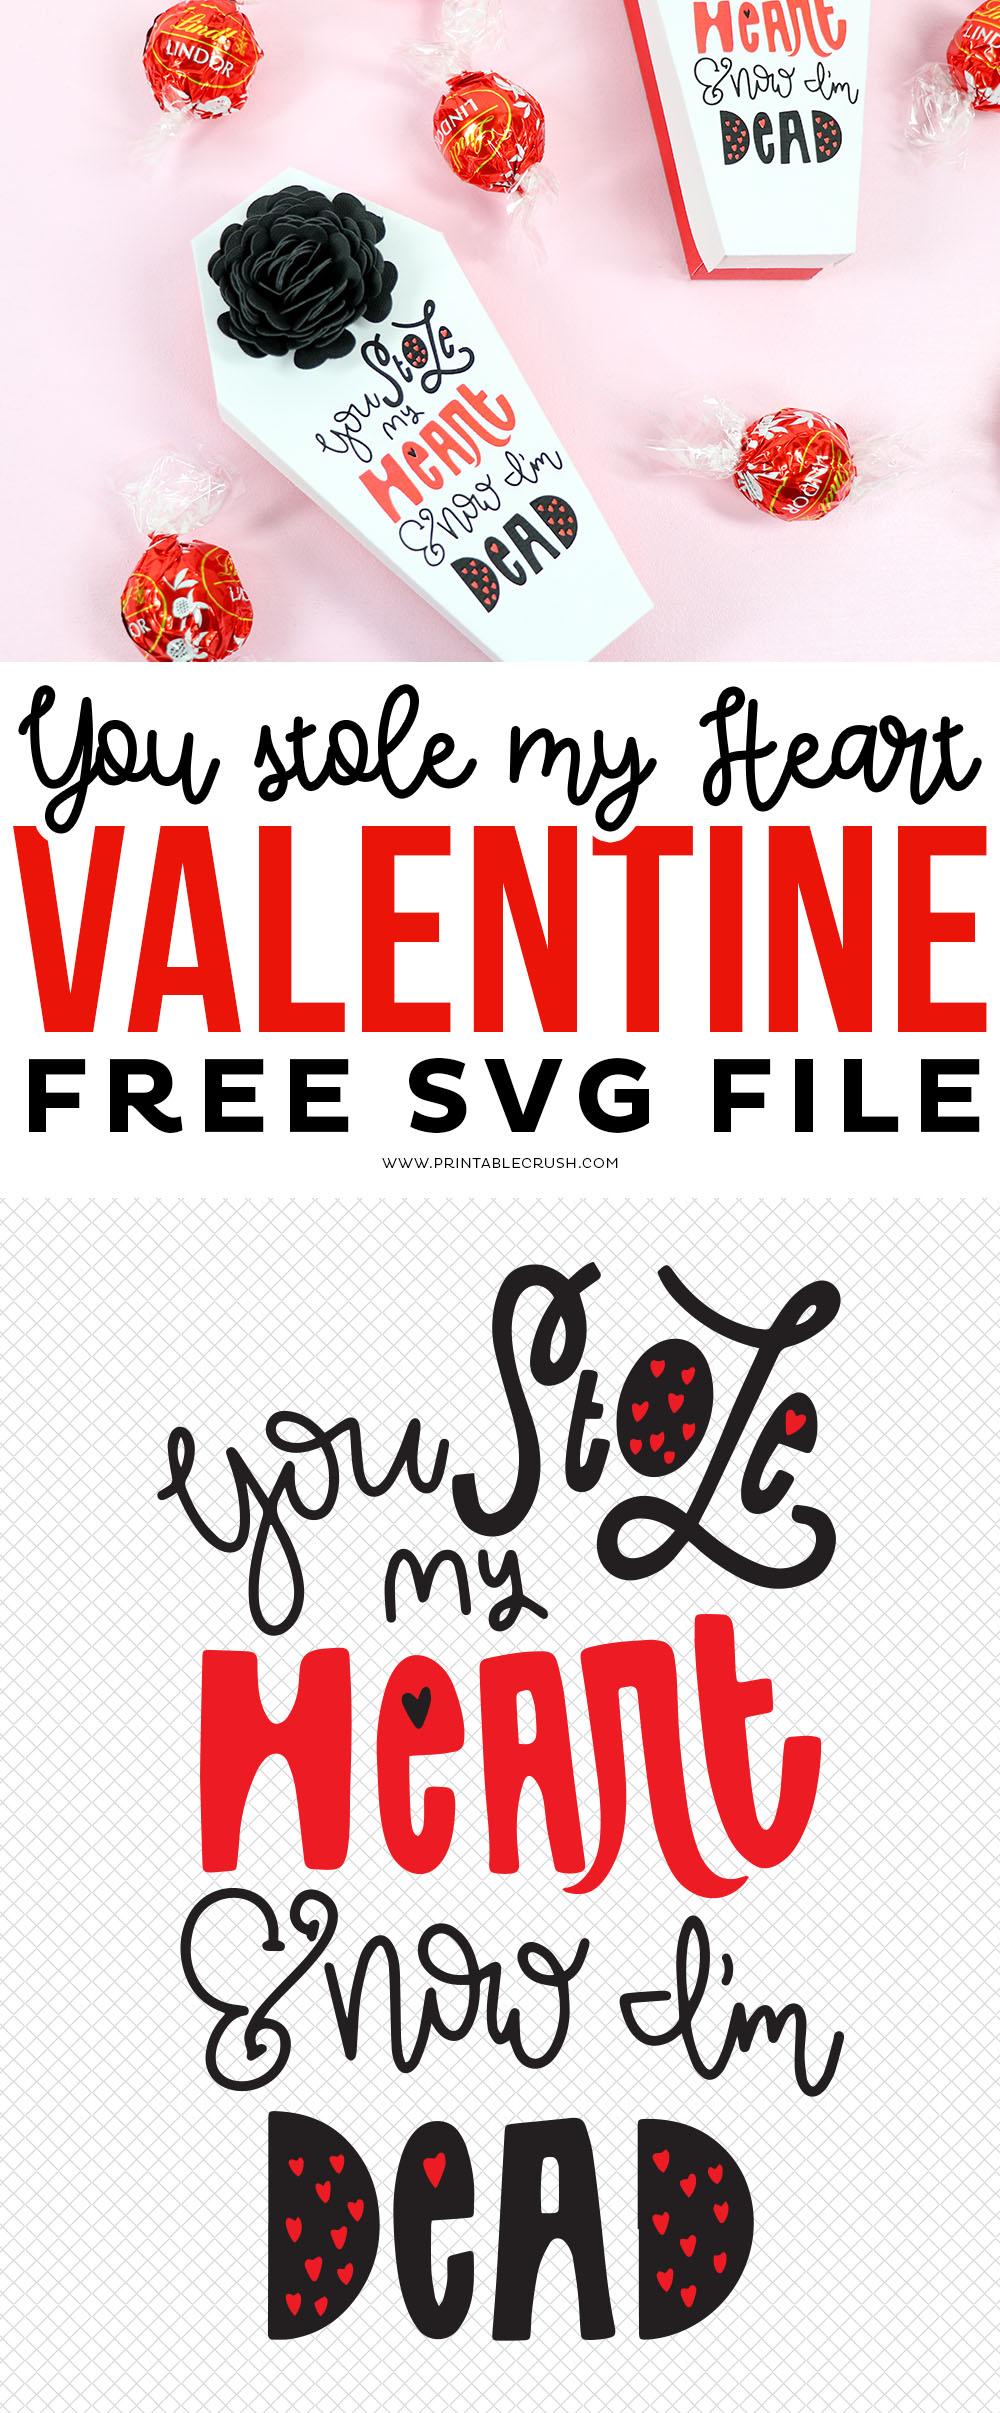 Morbid and Free Valentine SVG File